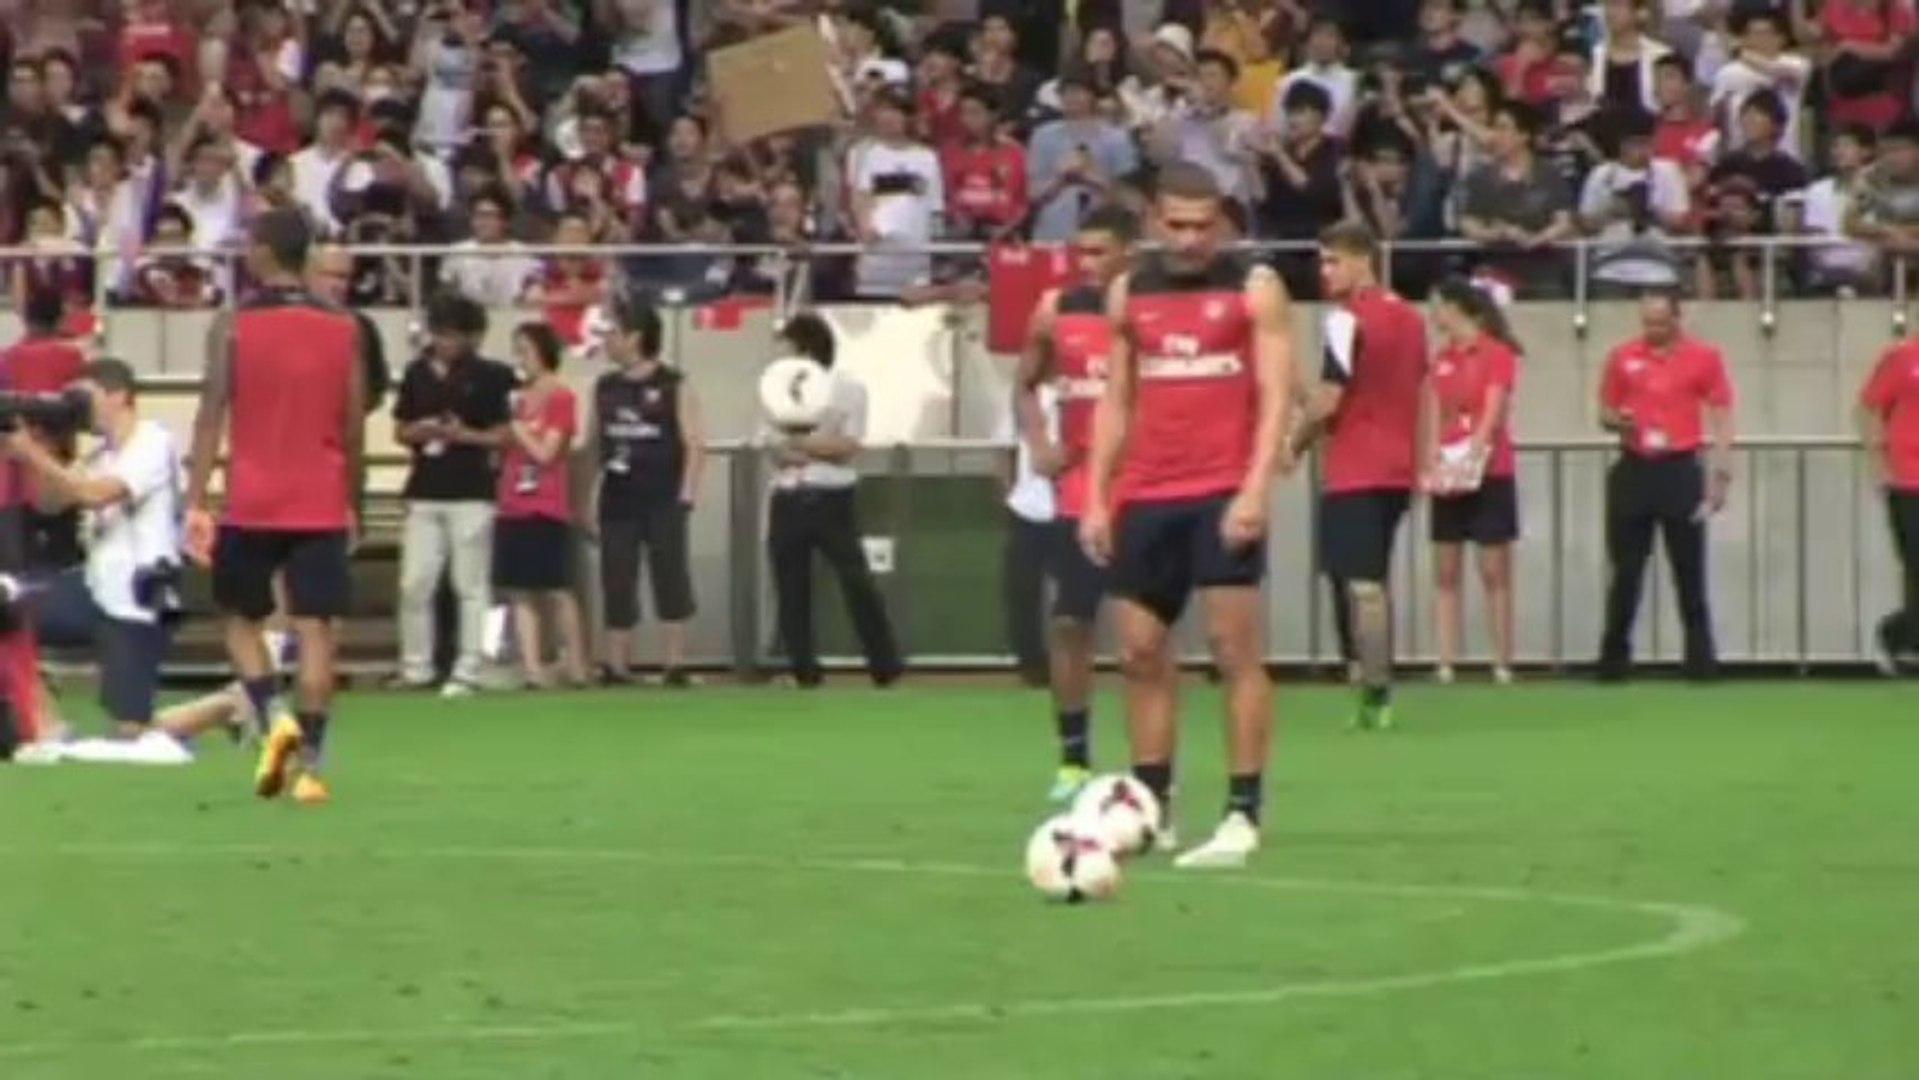 Transferts - Arsenal tente mais ne signe pas